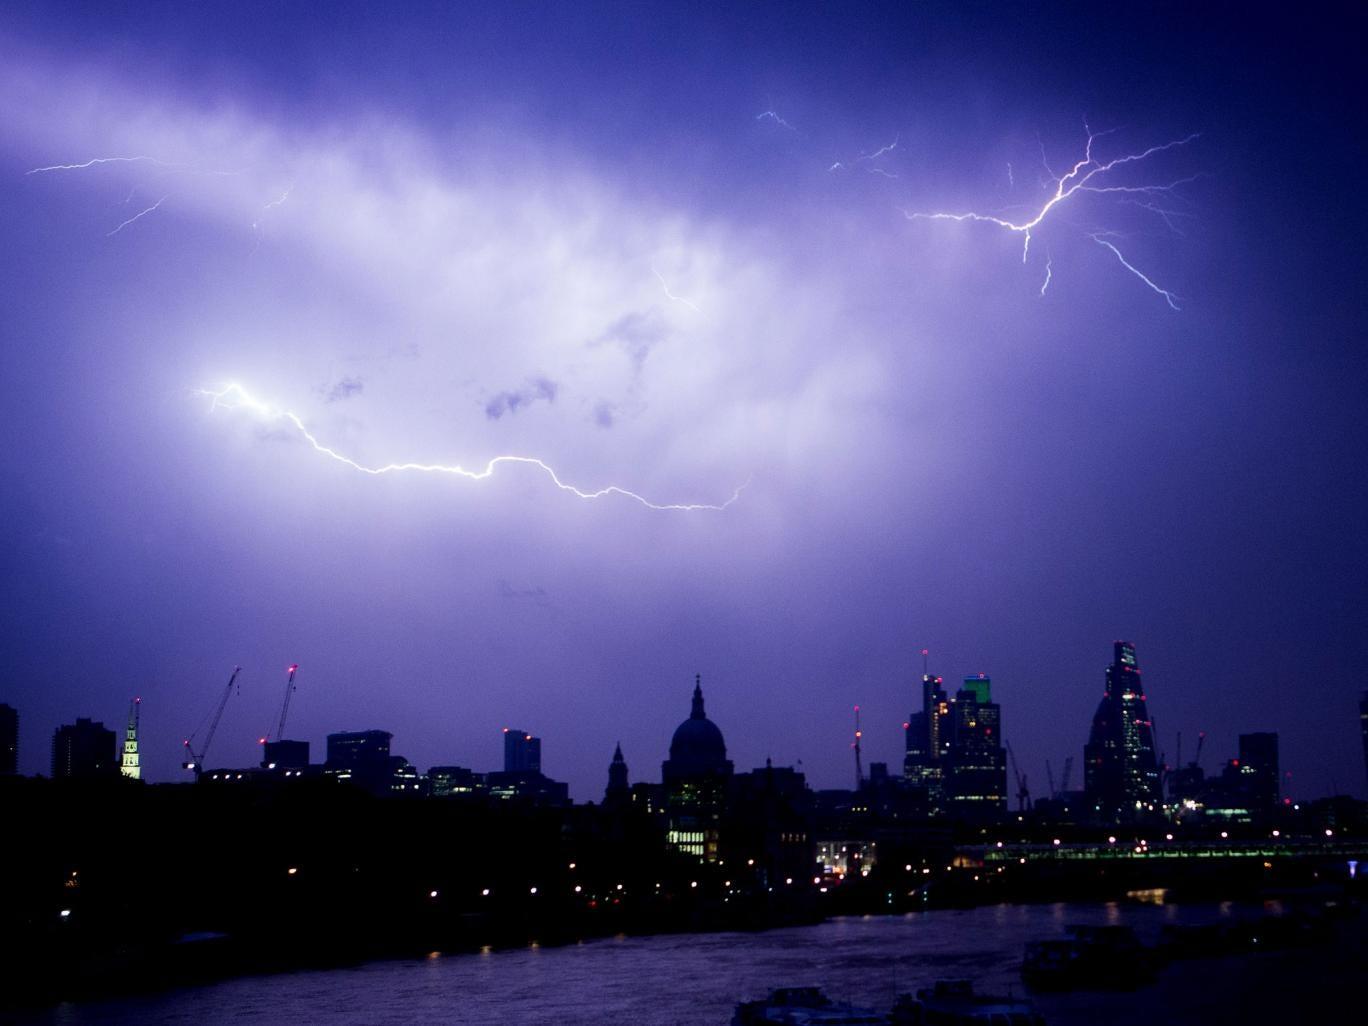 Lightning over central London as major storms kept the city awake overnight